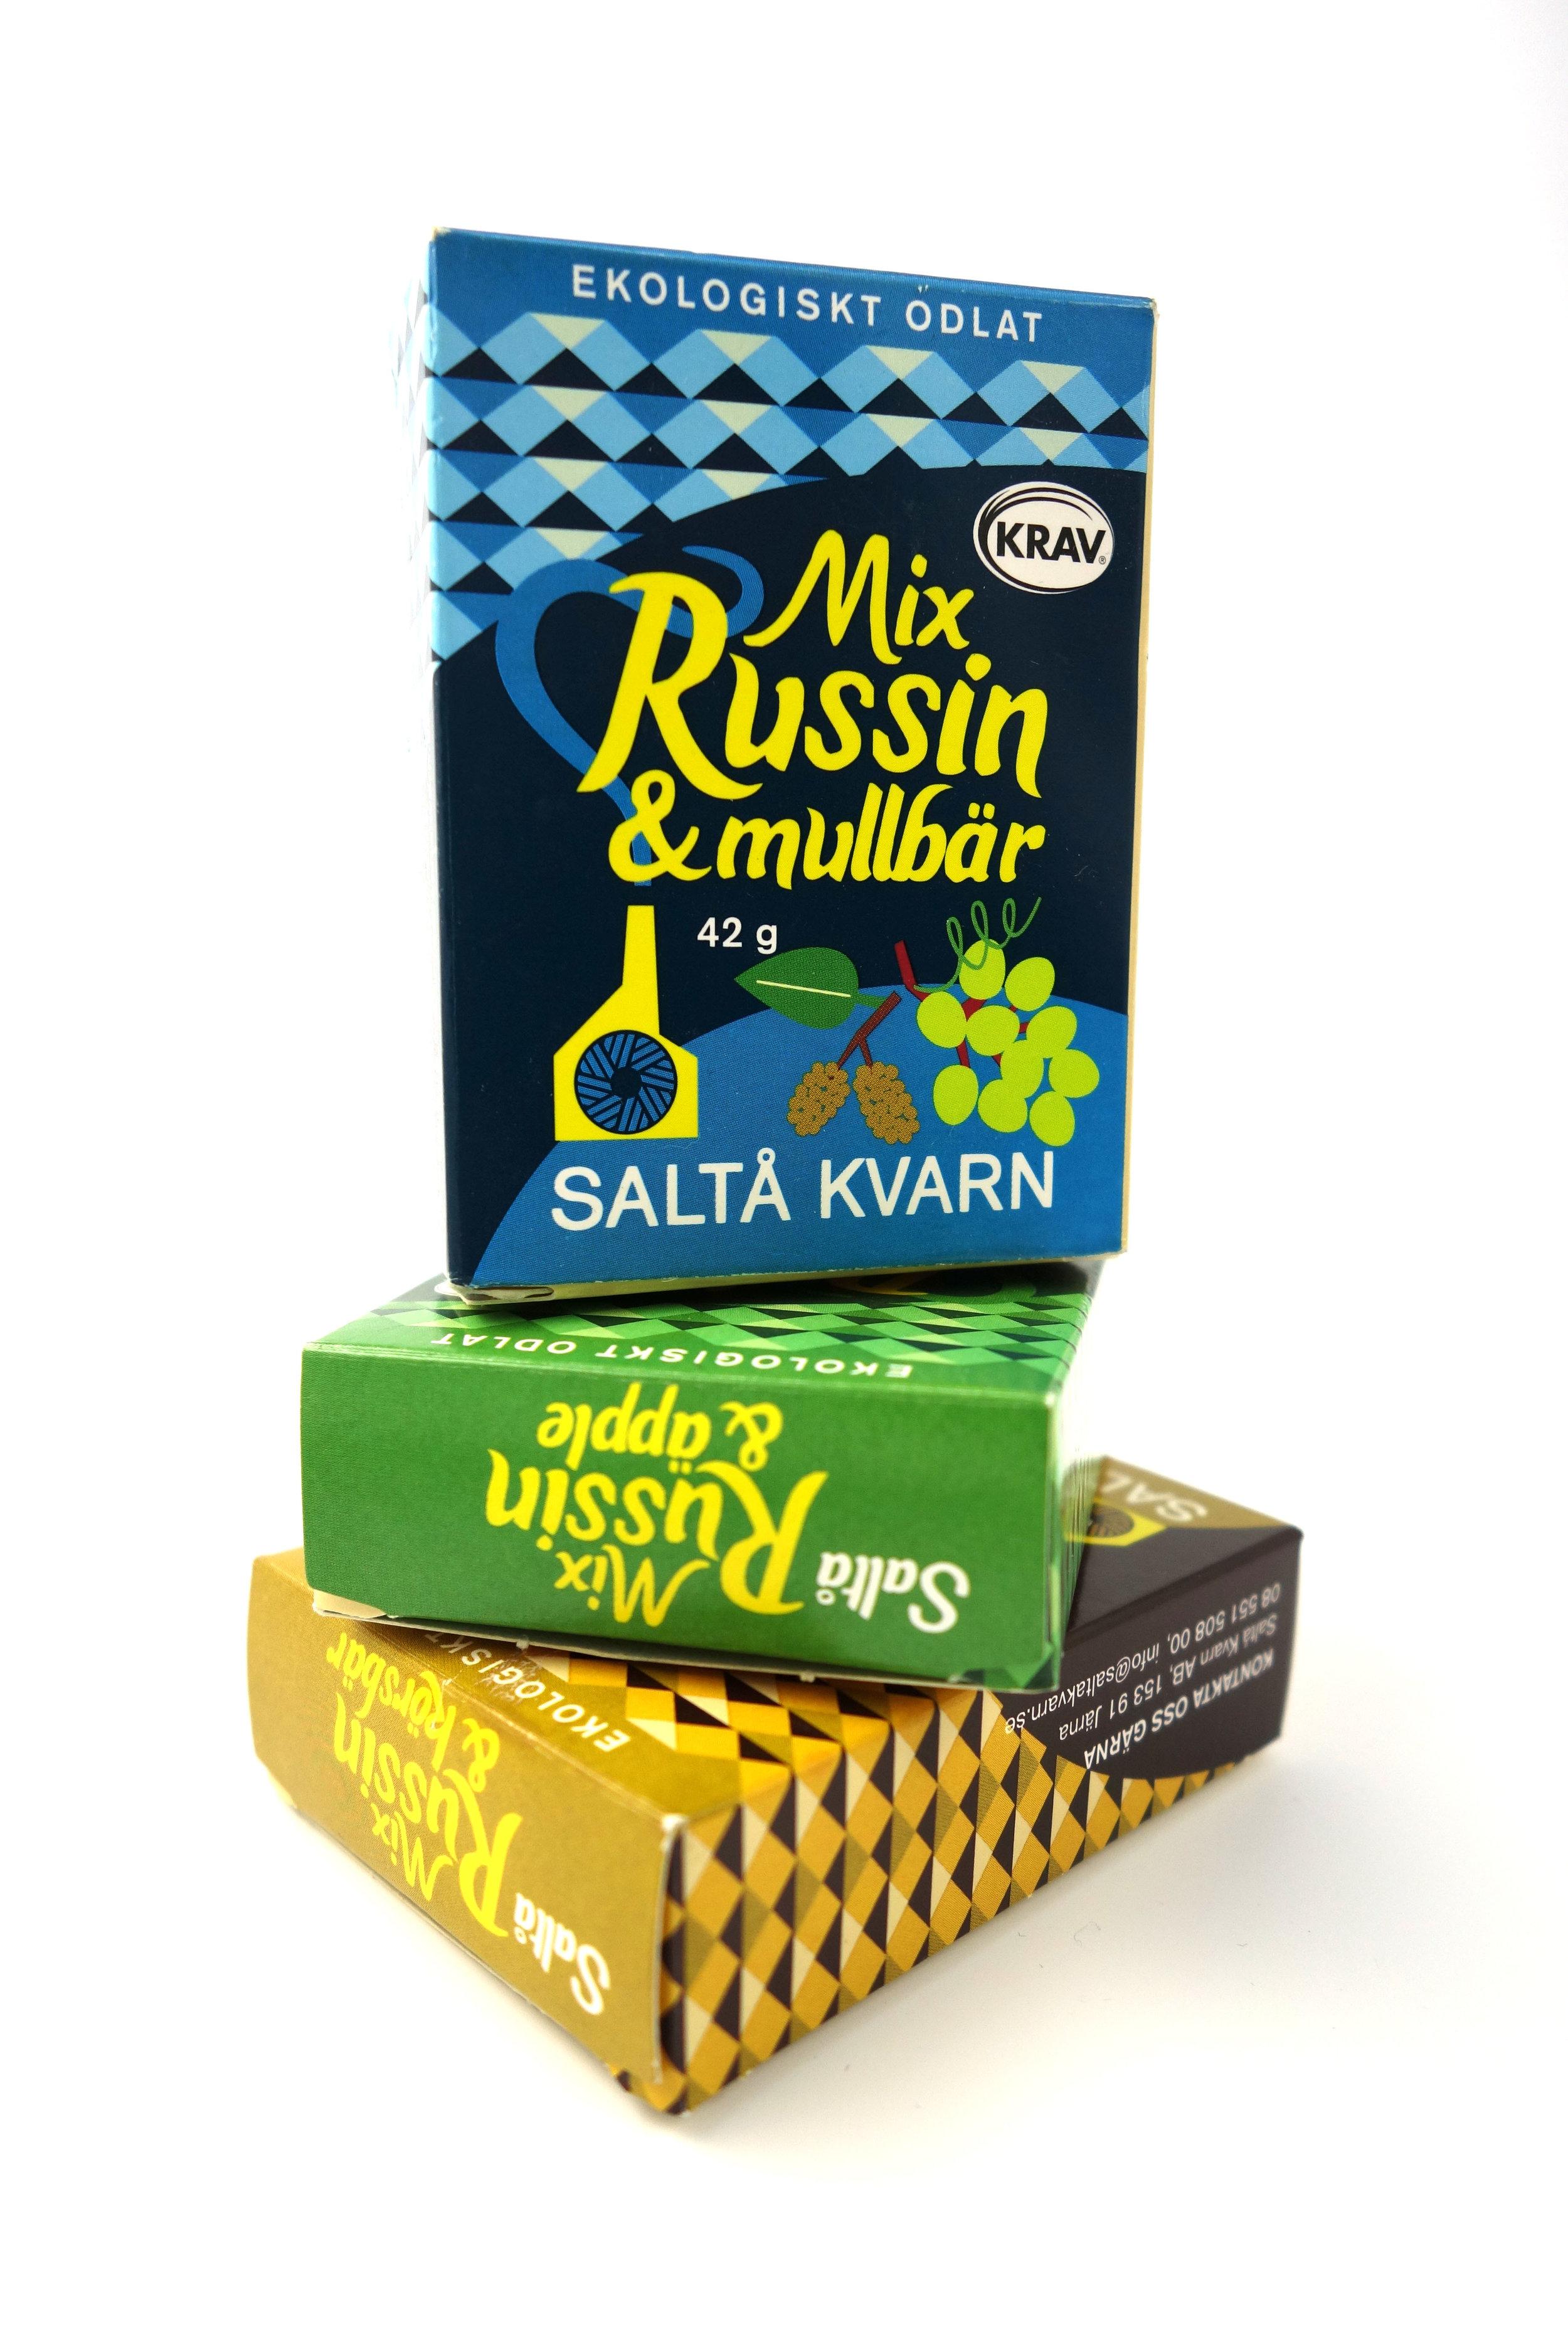 Saltå Kvarn | Sweden   https://www.saltakvarn.se